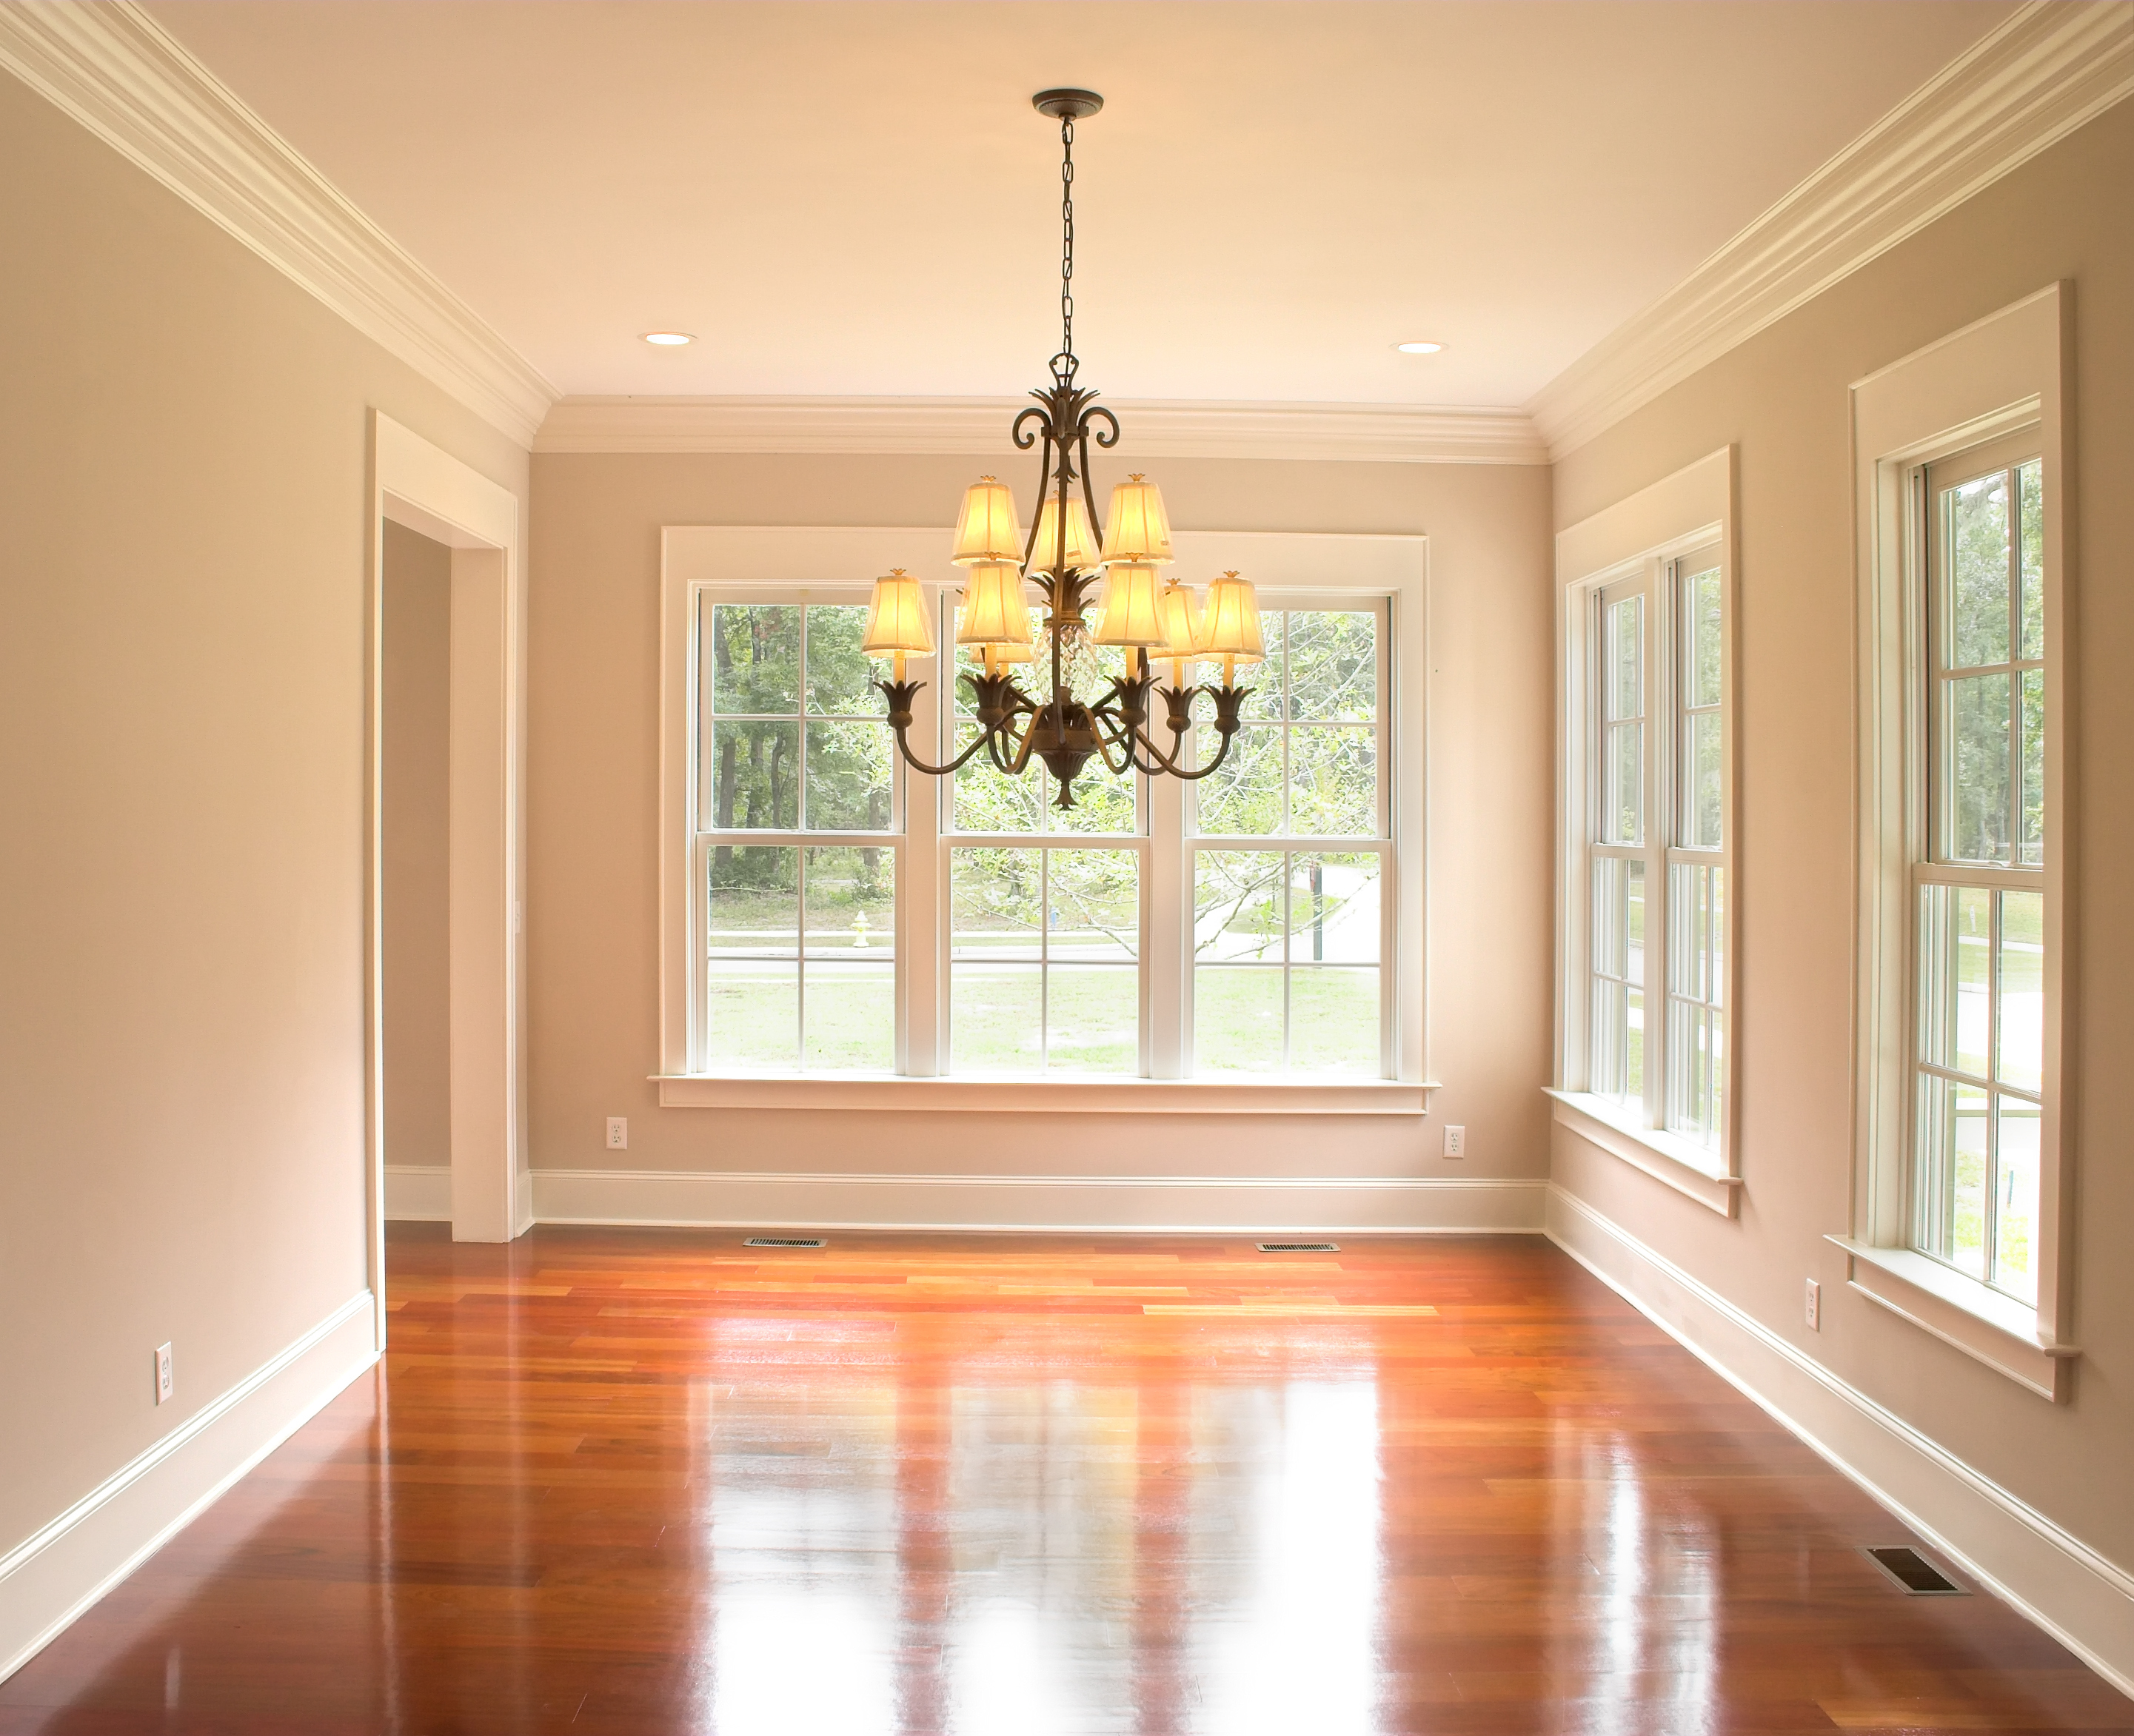 change-windows-doors-rental-property-increase-value